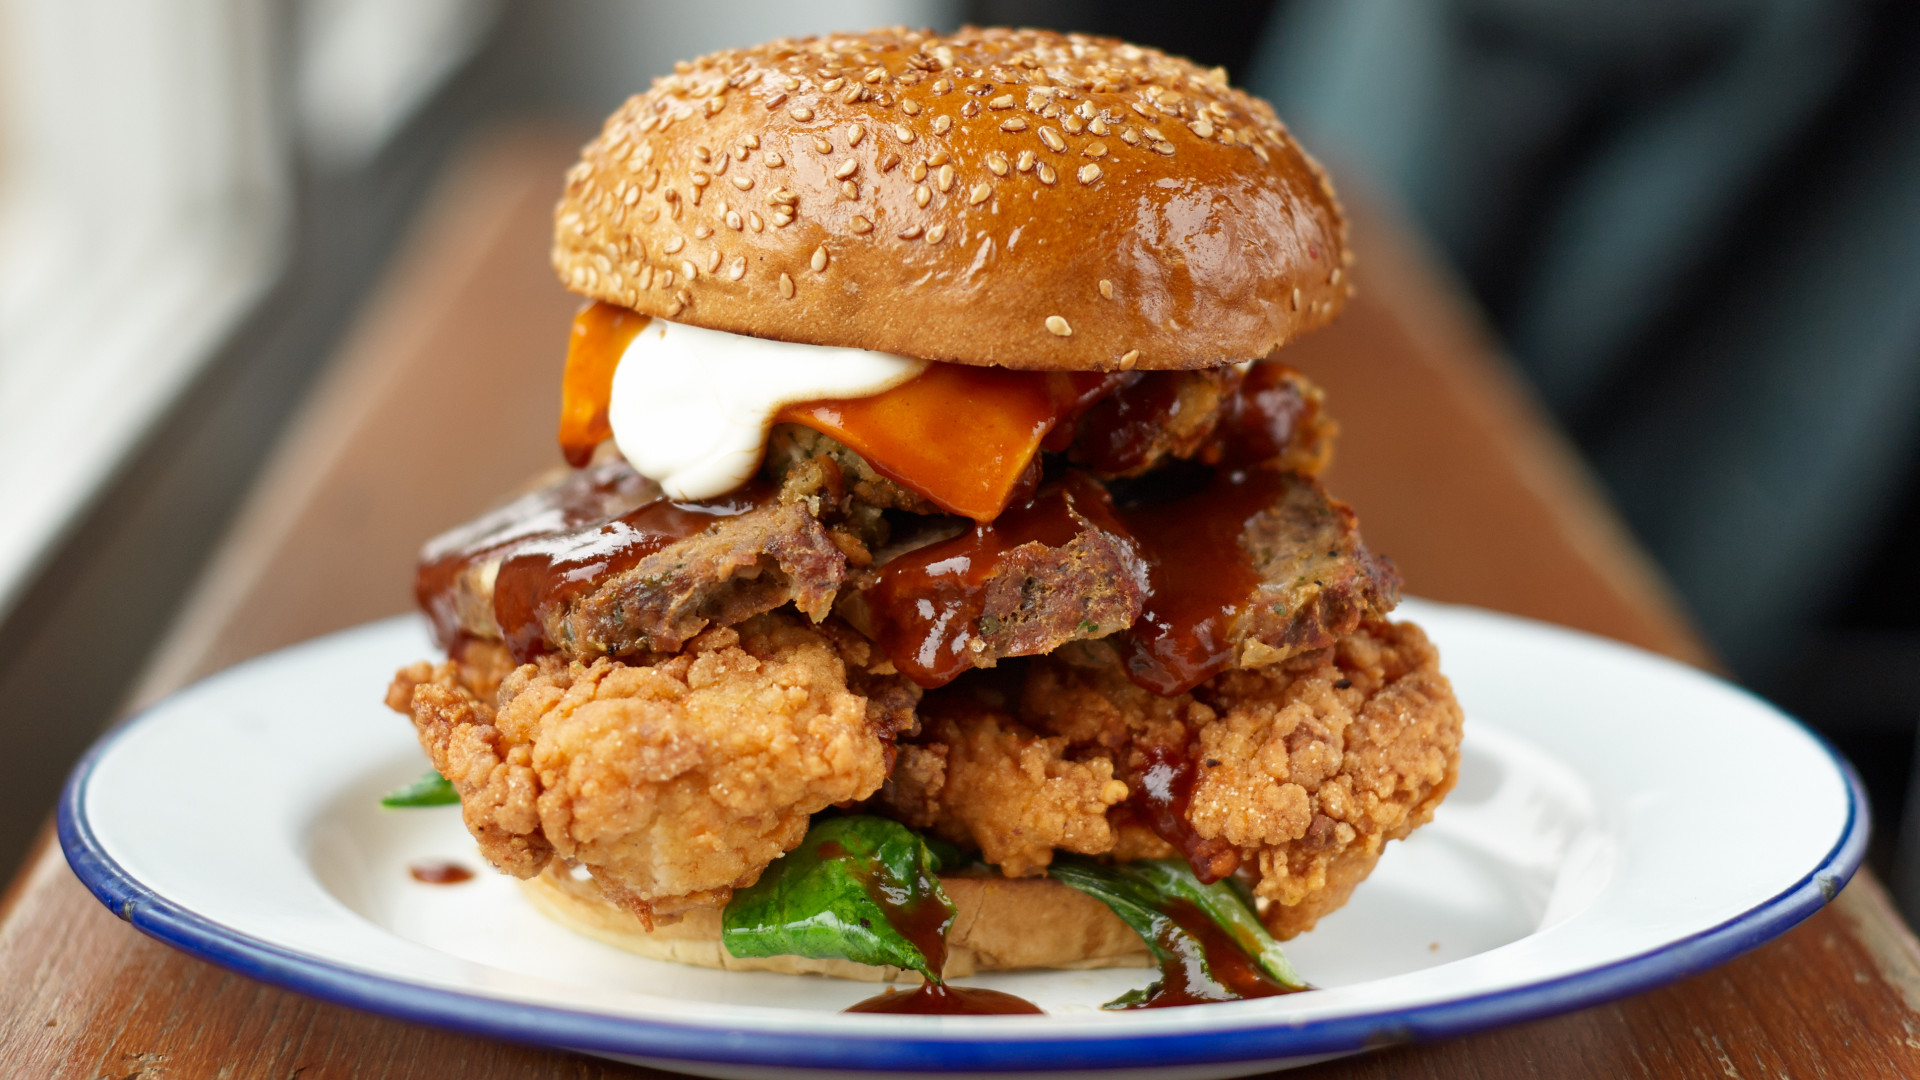 Ben's Canteen's Thanksgiving burger